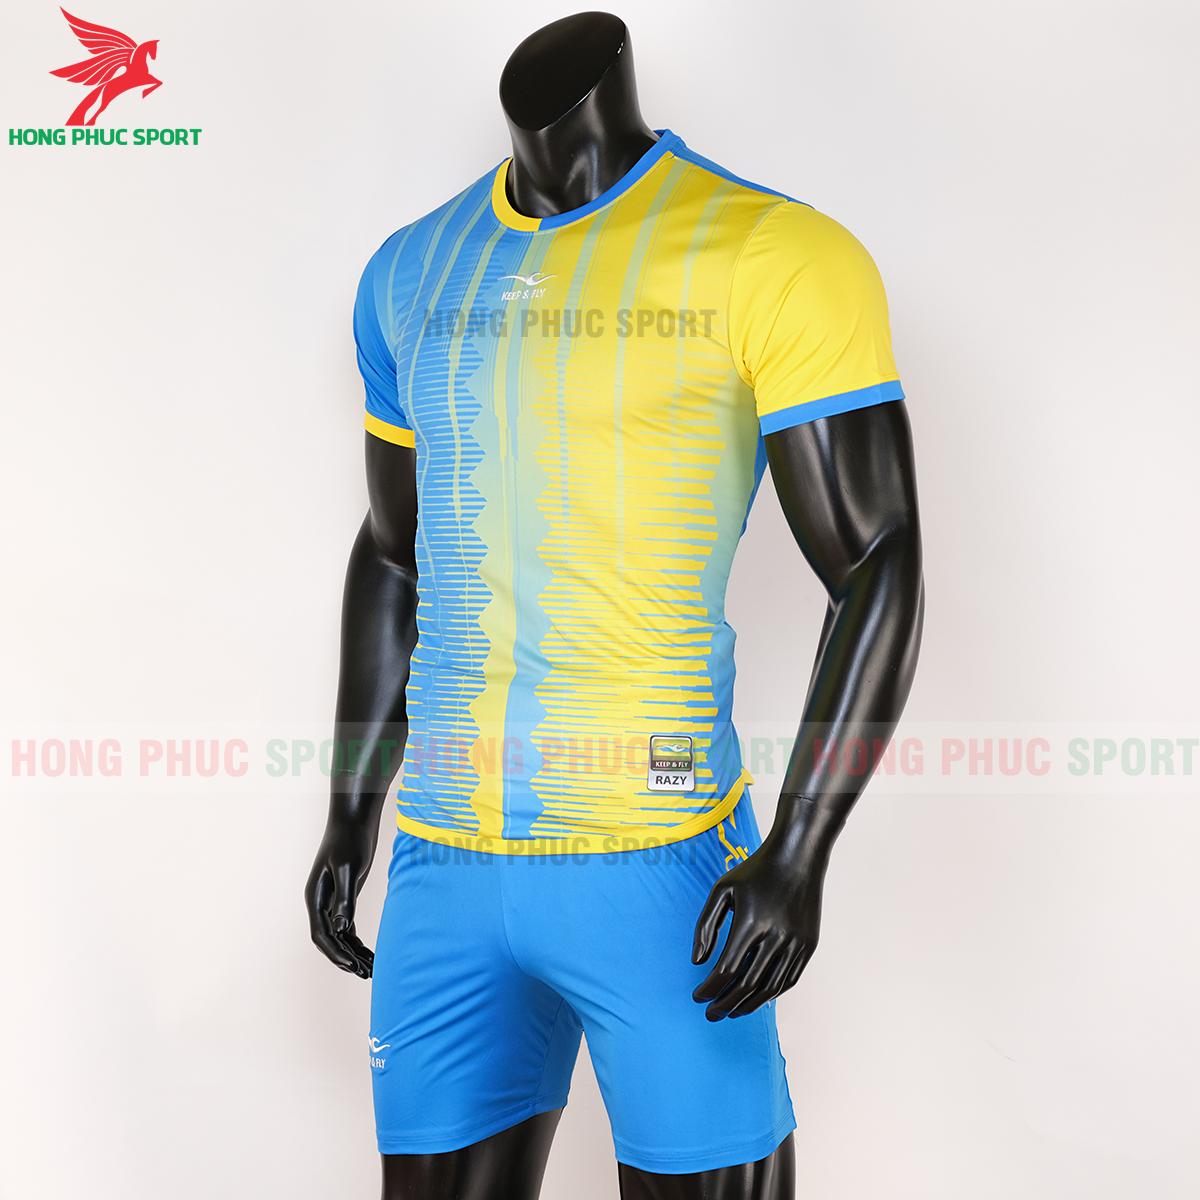 https://cdn.hongphucsport.com/unsafe/s4.shopbay.vn/files/285/ao-bong-da-keep-fly-razy-vang-xanh-trai-5f719a338f425.png